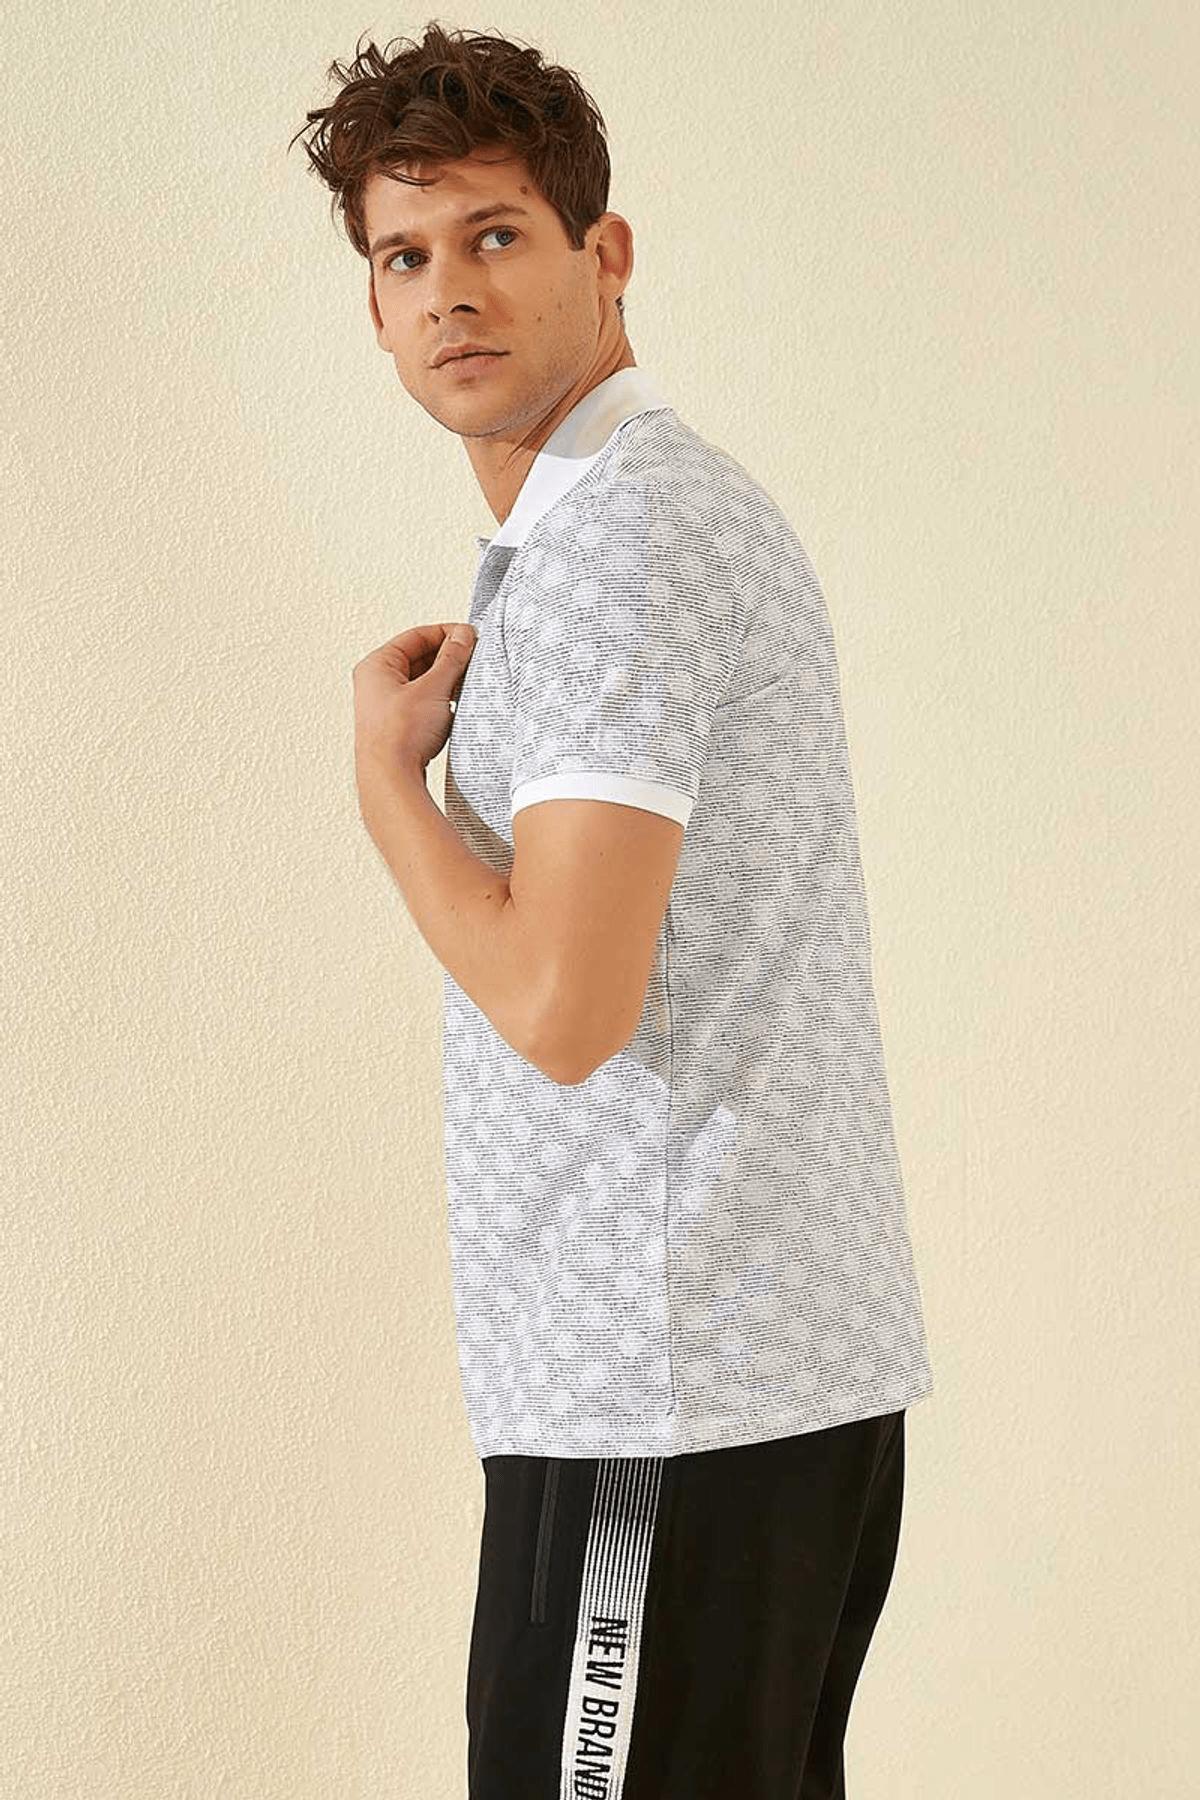 Tommy Life Baskılı Polo Yaka Beyaz Erkek T-Shirt T08ER-87796_1 2